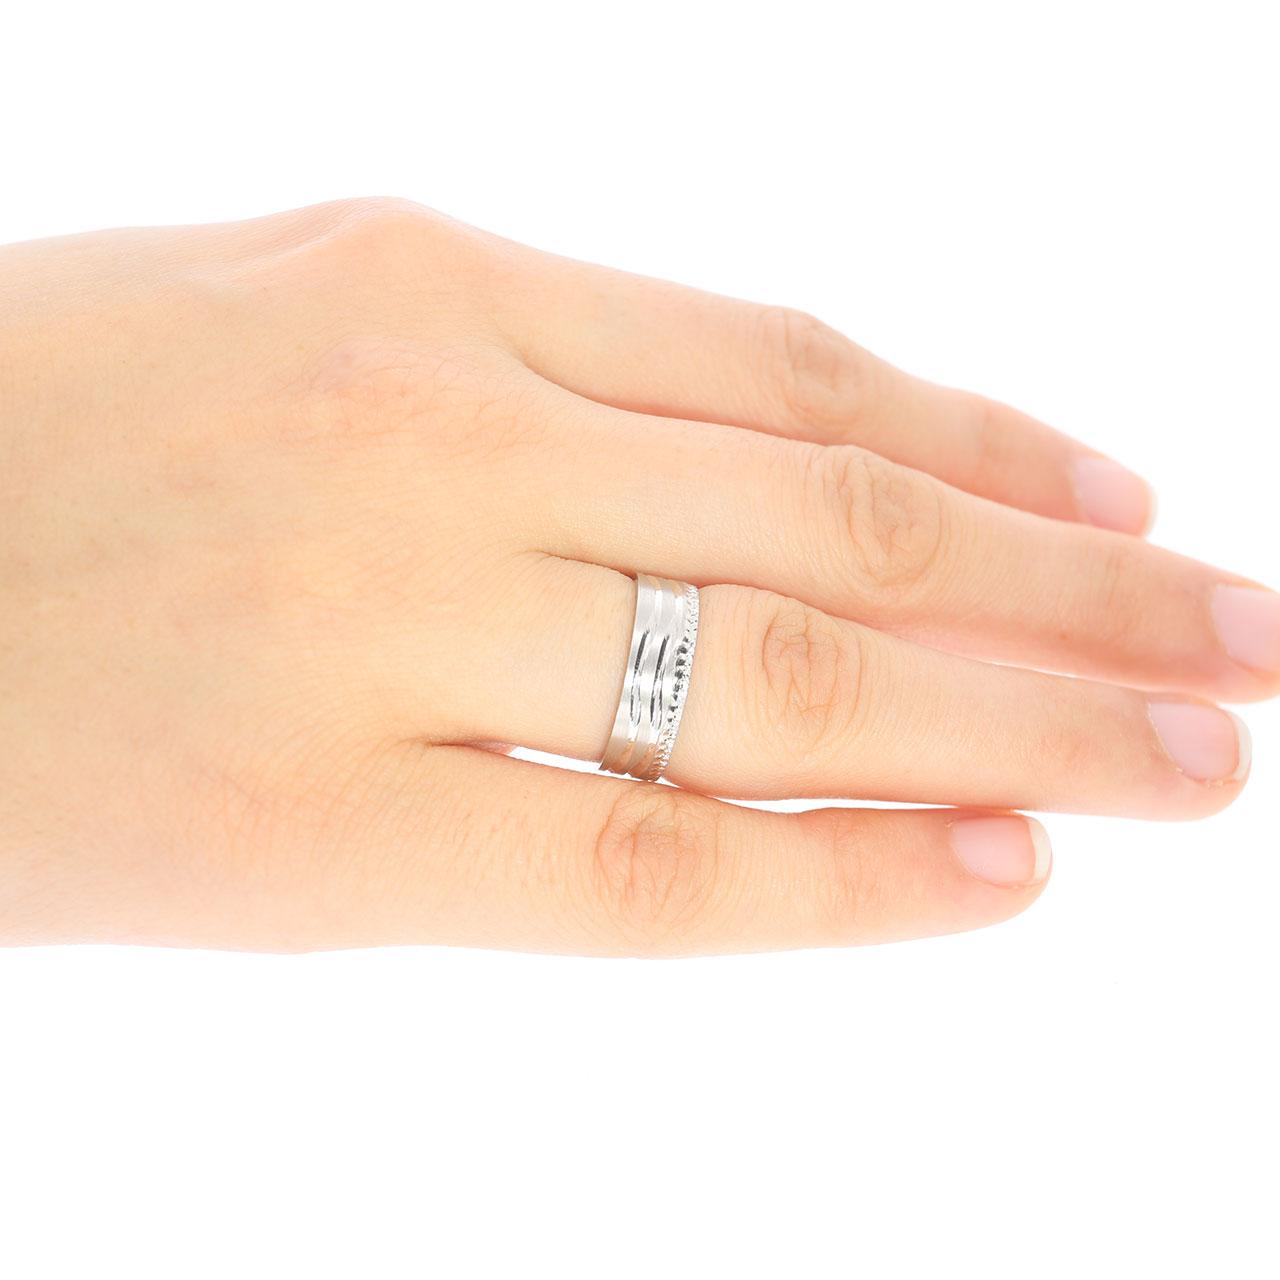 6mm Flat Oluklu Gümüş Alyans